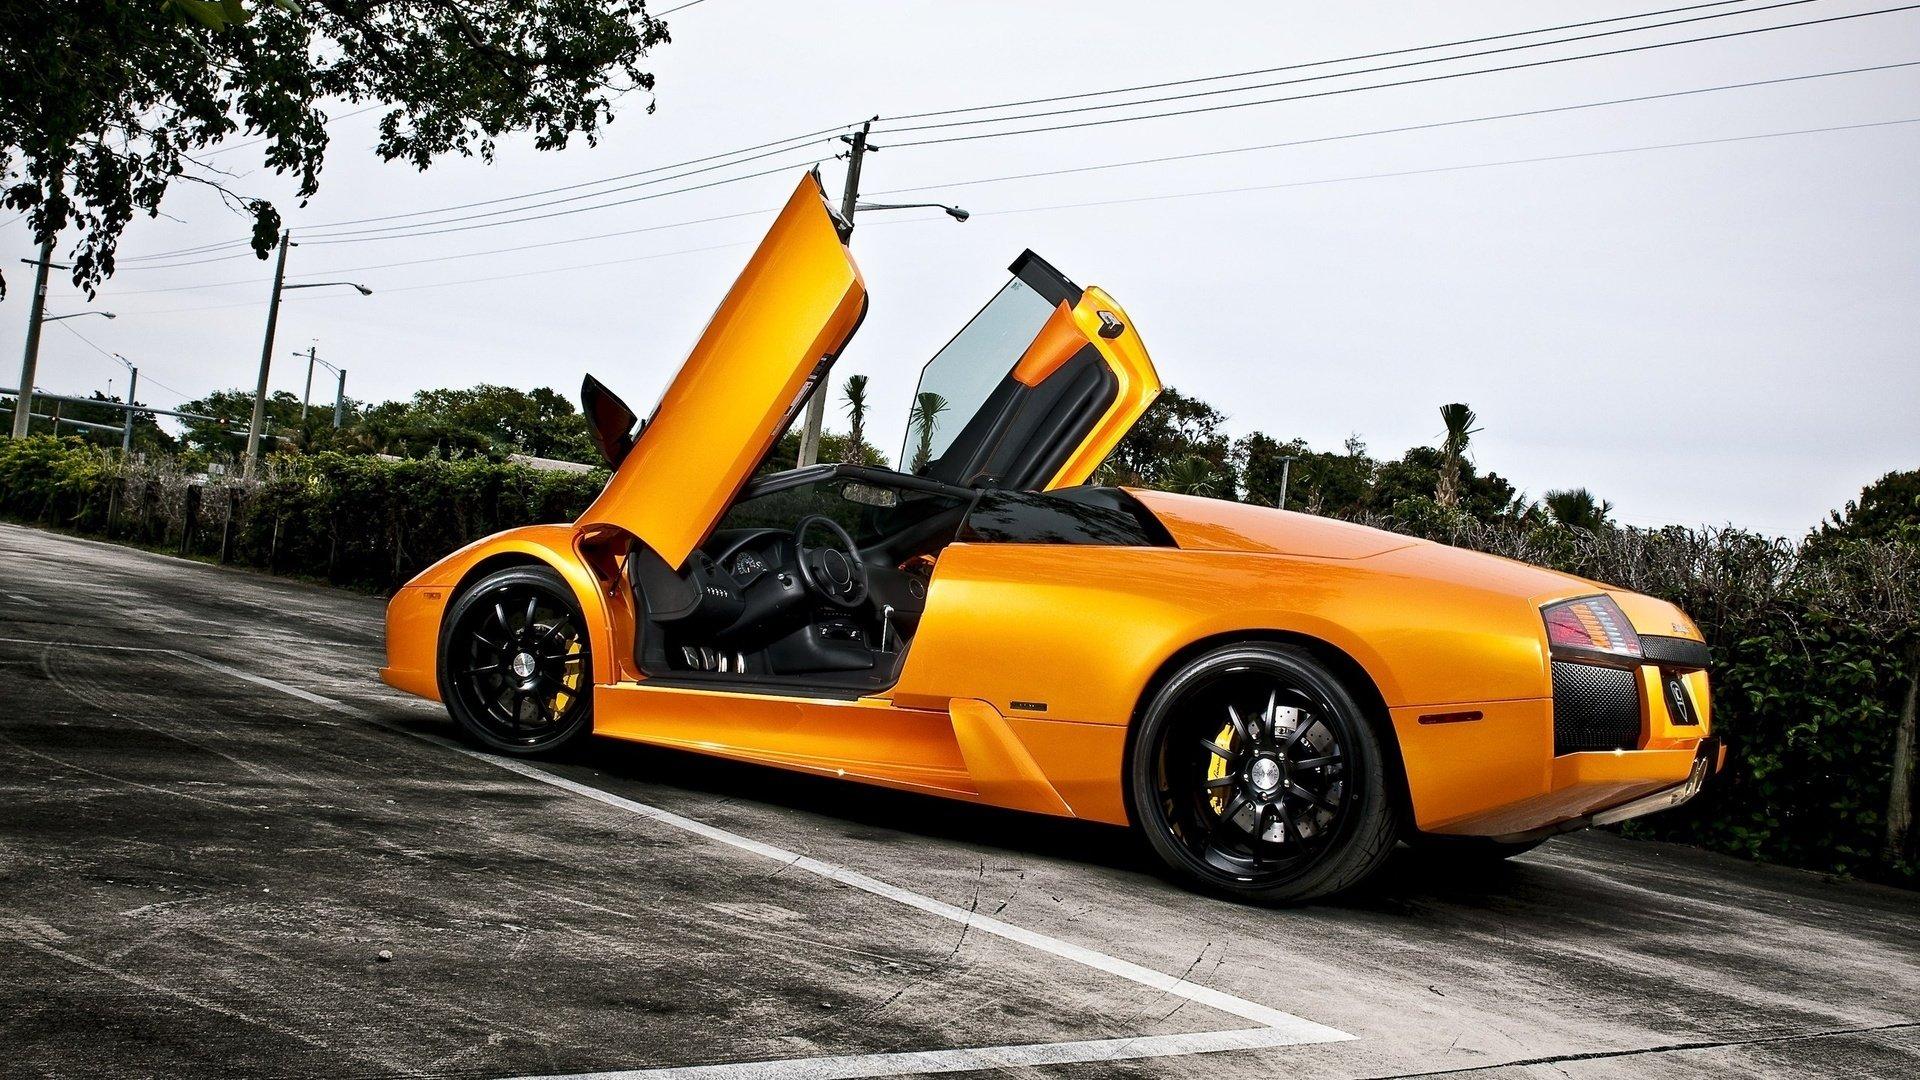 Download Hd 1080p Lamborghini Murcielago Desktop Wallpaper ID:155289 For  Free